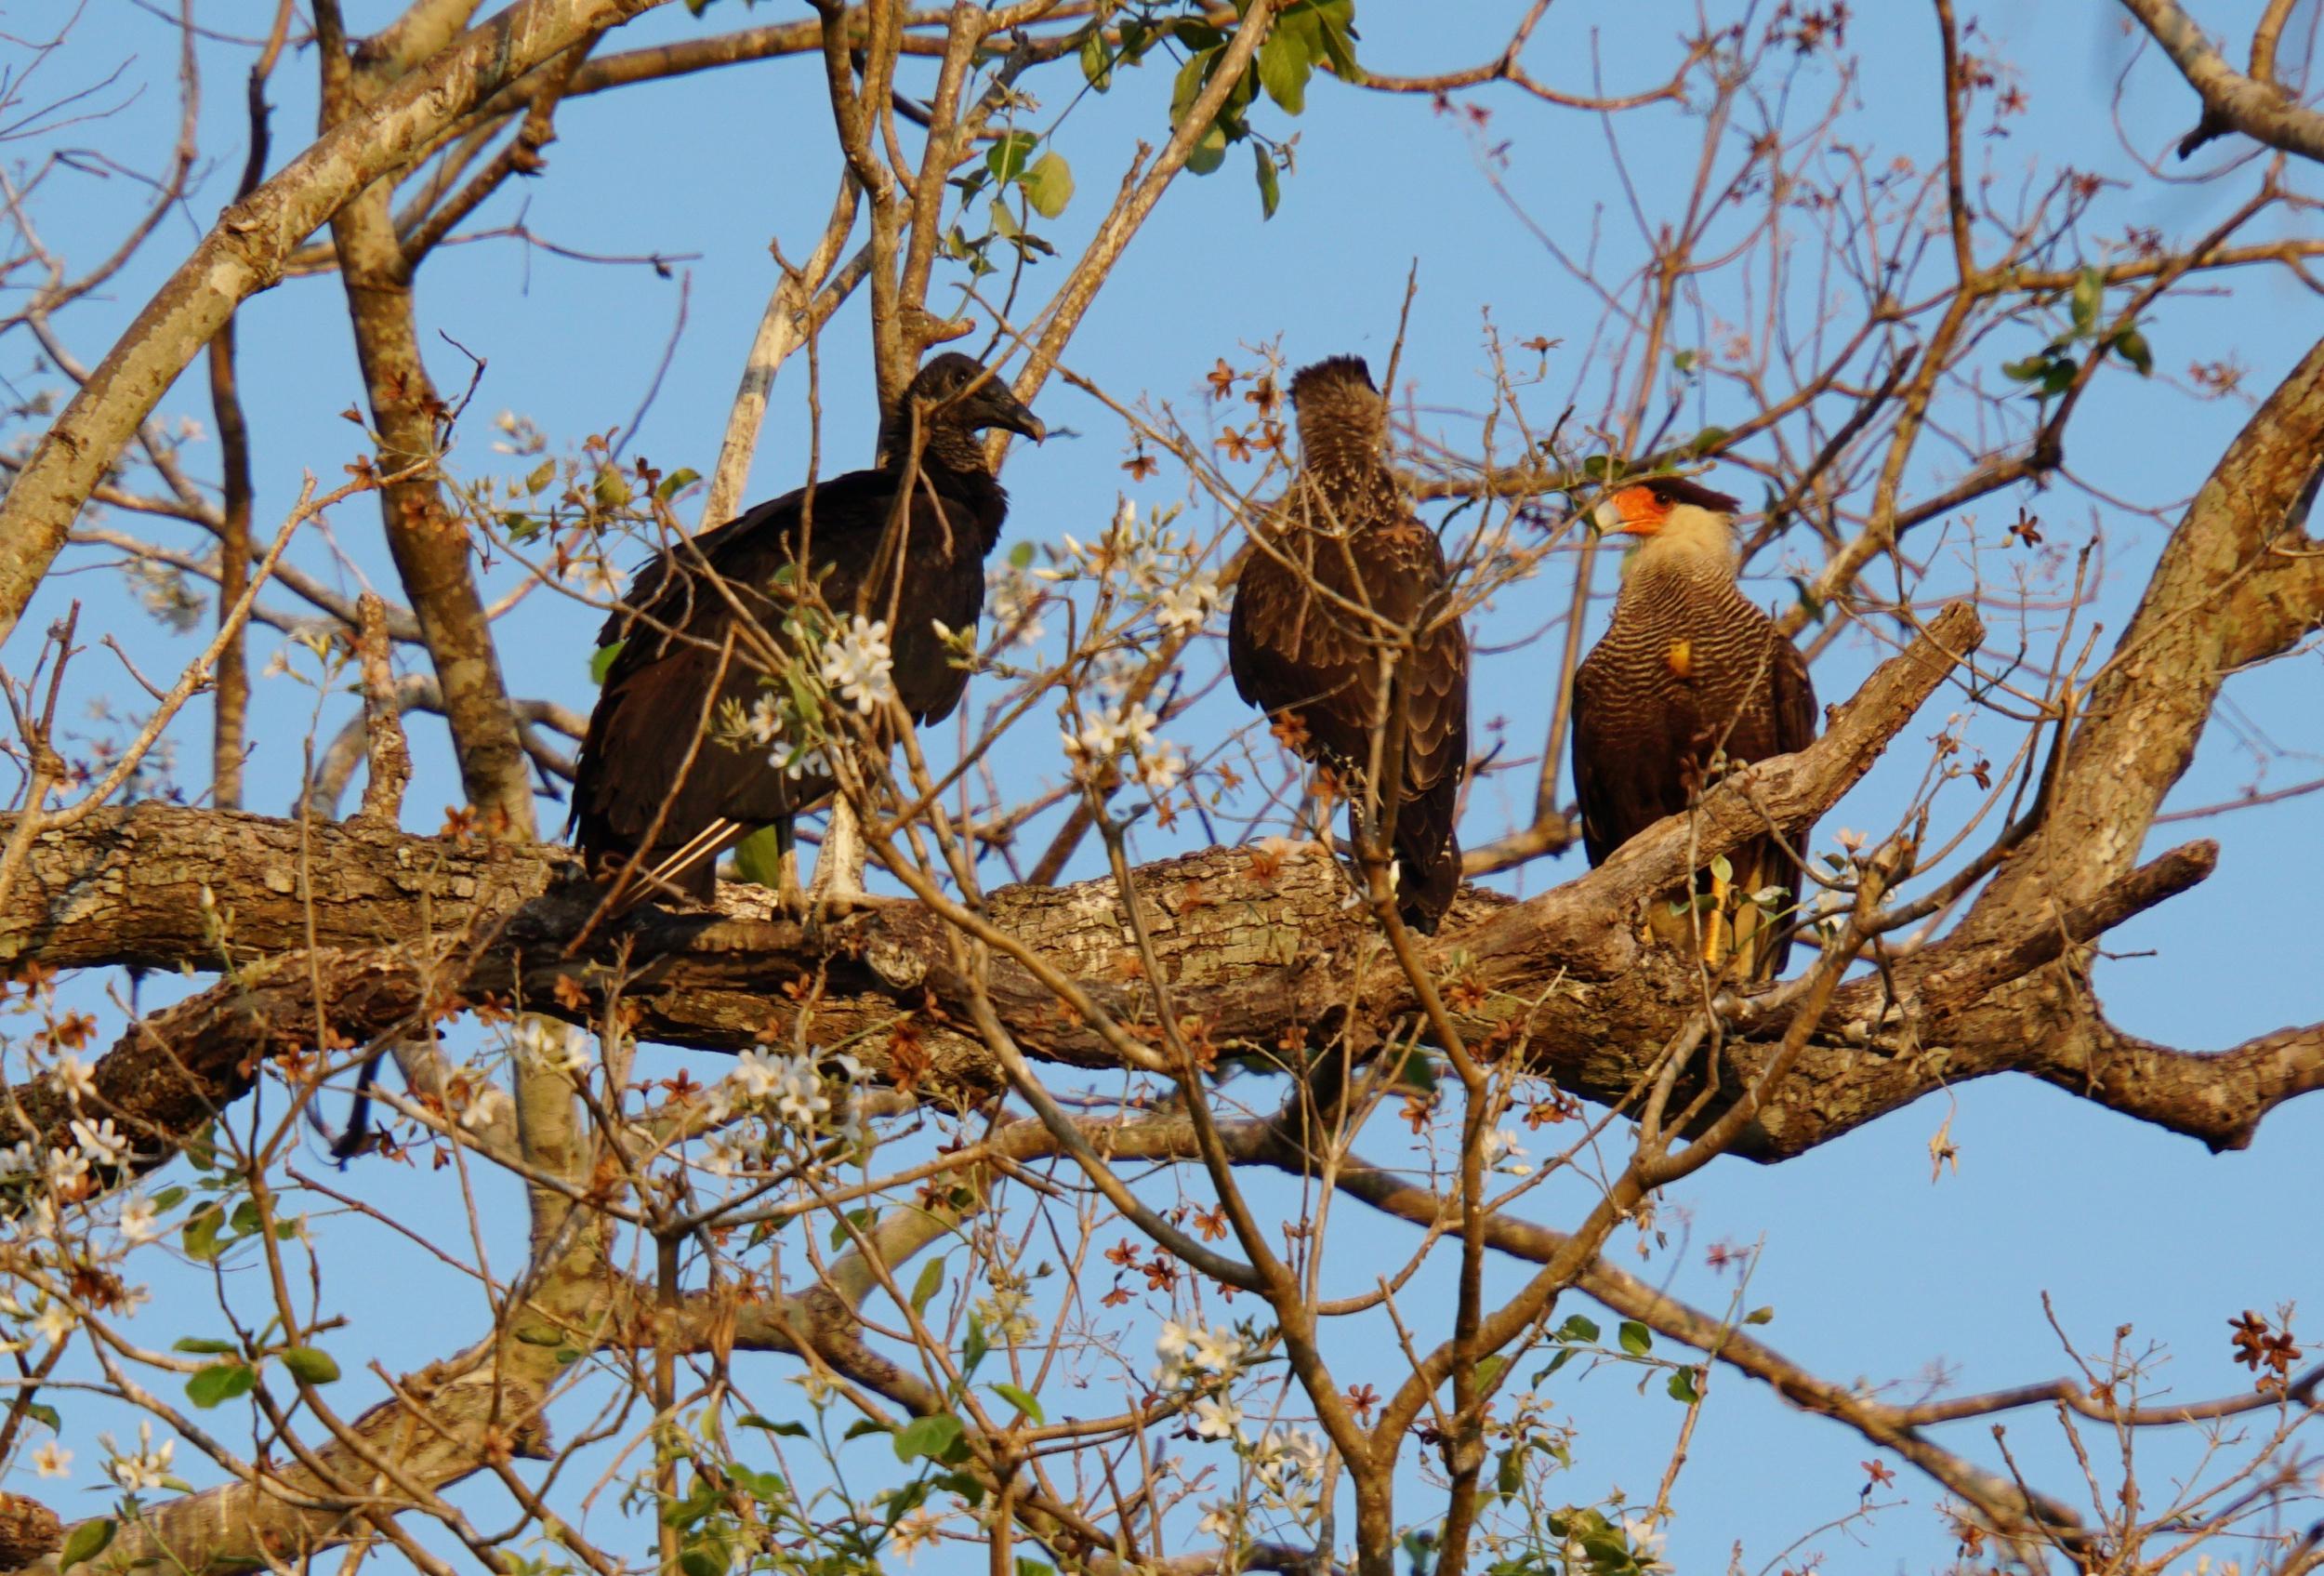 34. Black Vulture and Caracara